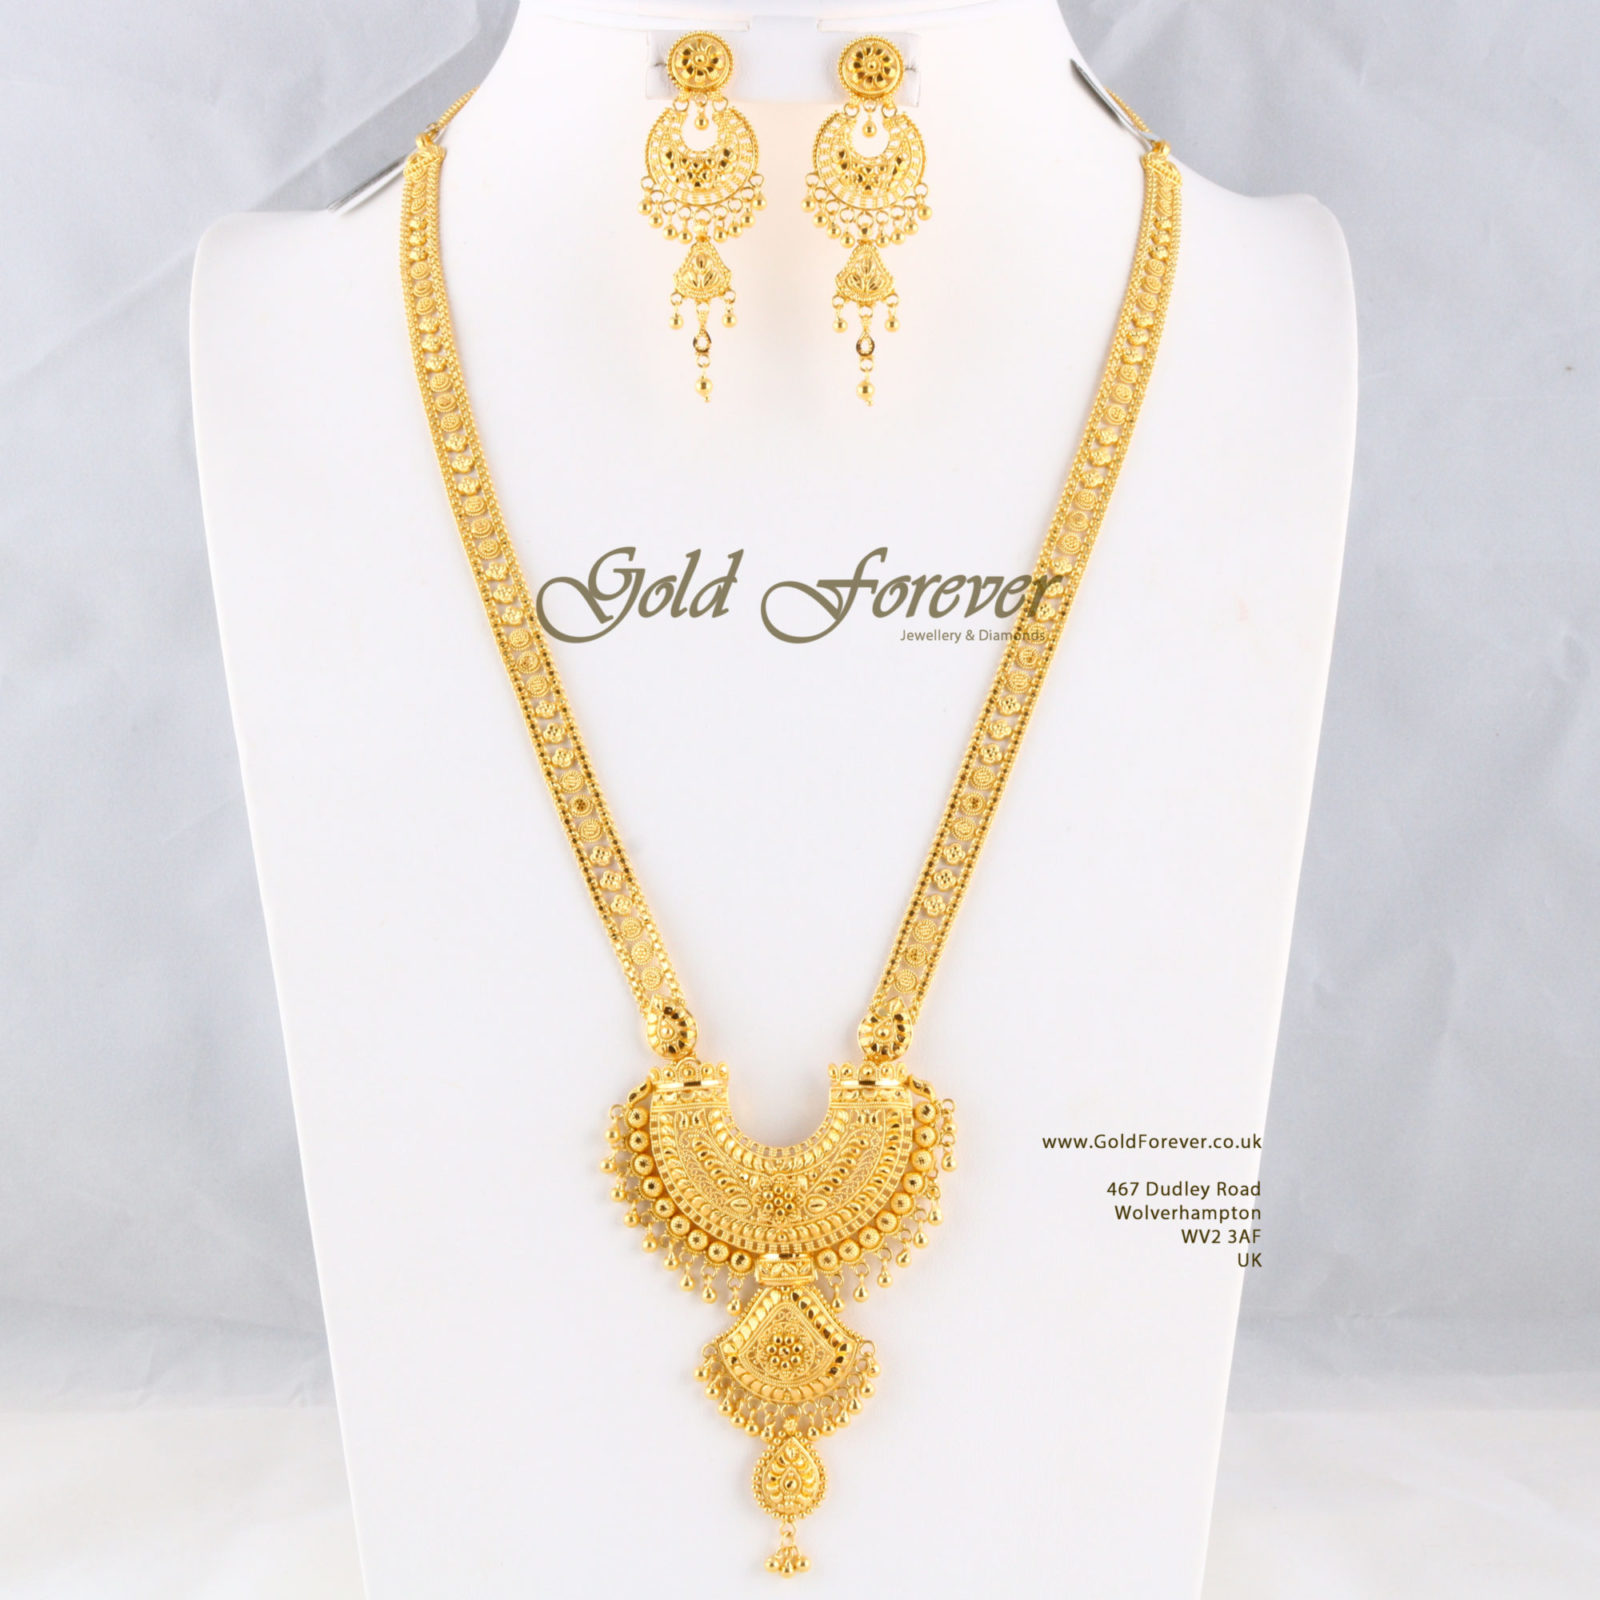 22 Carat Indian Gold Long Necklace 57 9 Grams Code Ls1118003